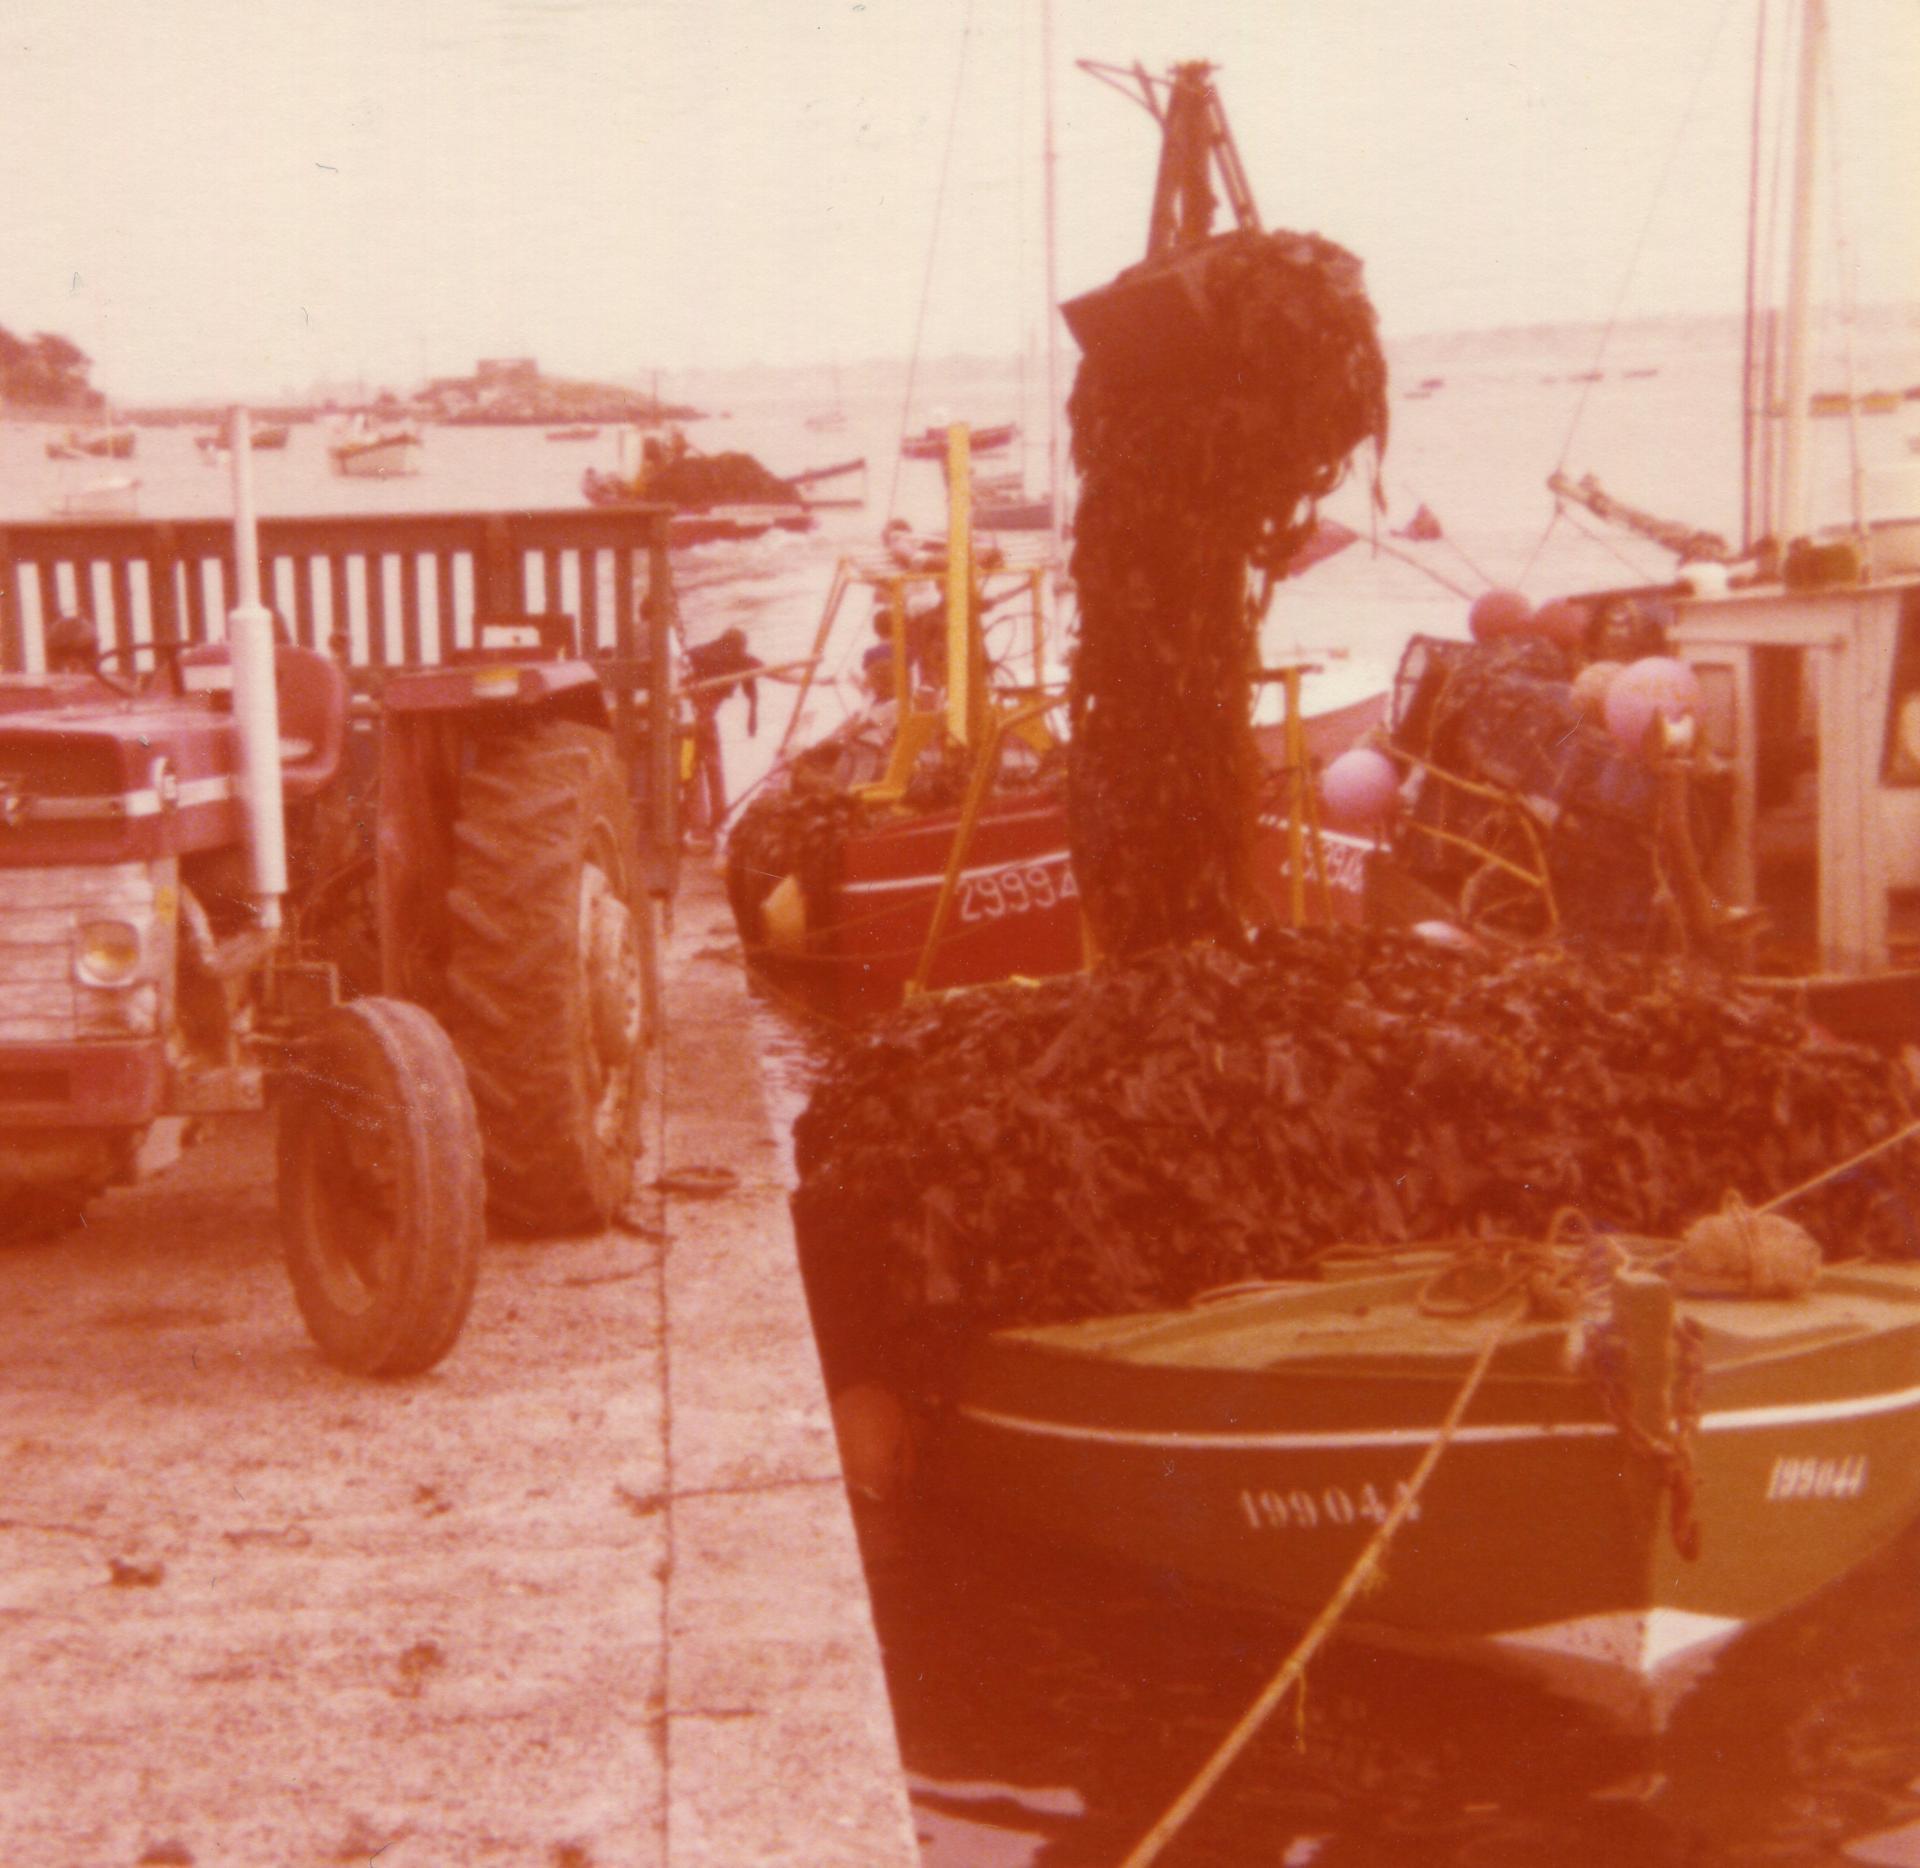 Francoise sant yann 1980 b erwan guegueniat